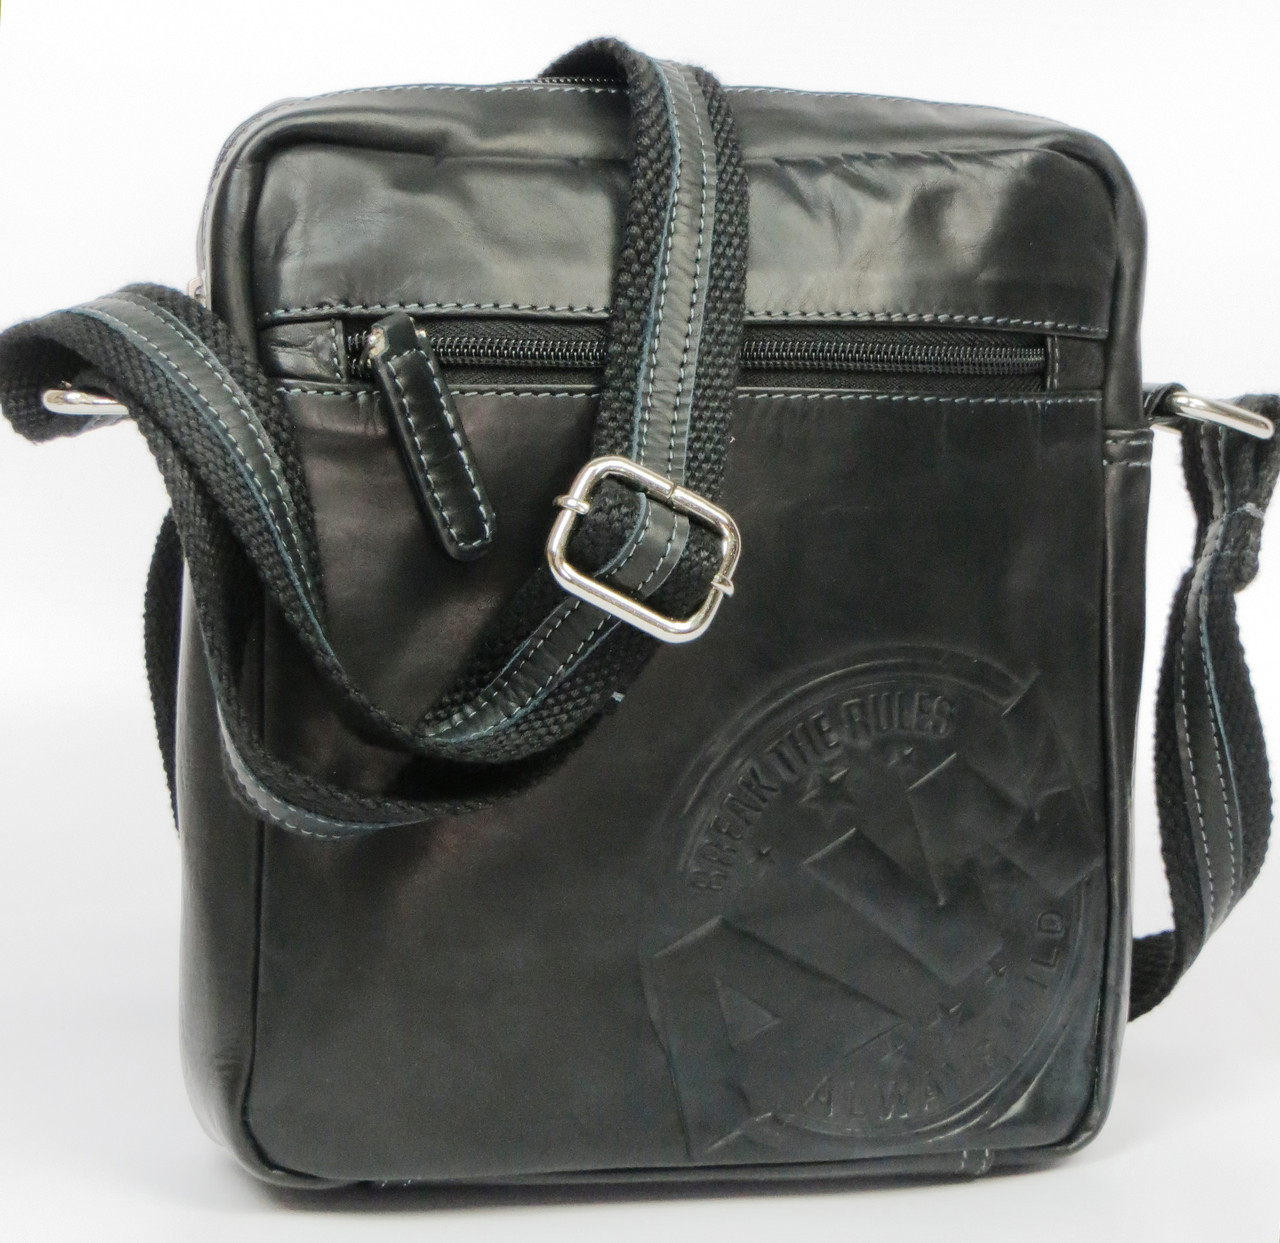 2d7bde5abf00 Кожаная сумка для документов Always Wild 242WS черная: продажа, цена ...